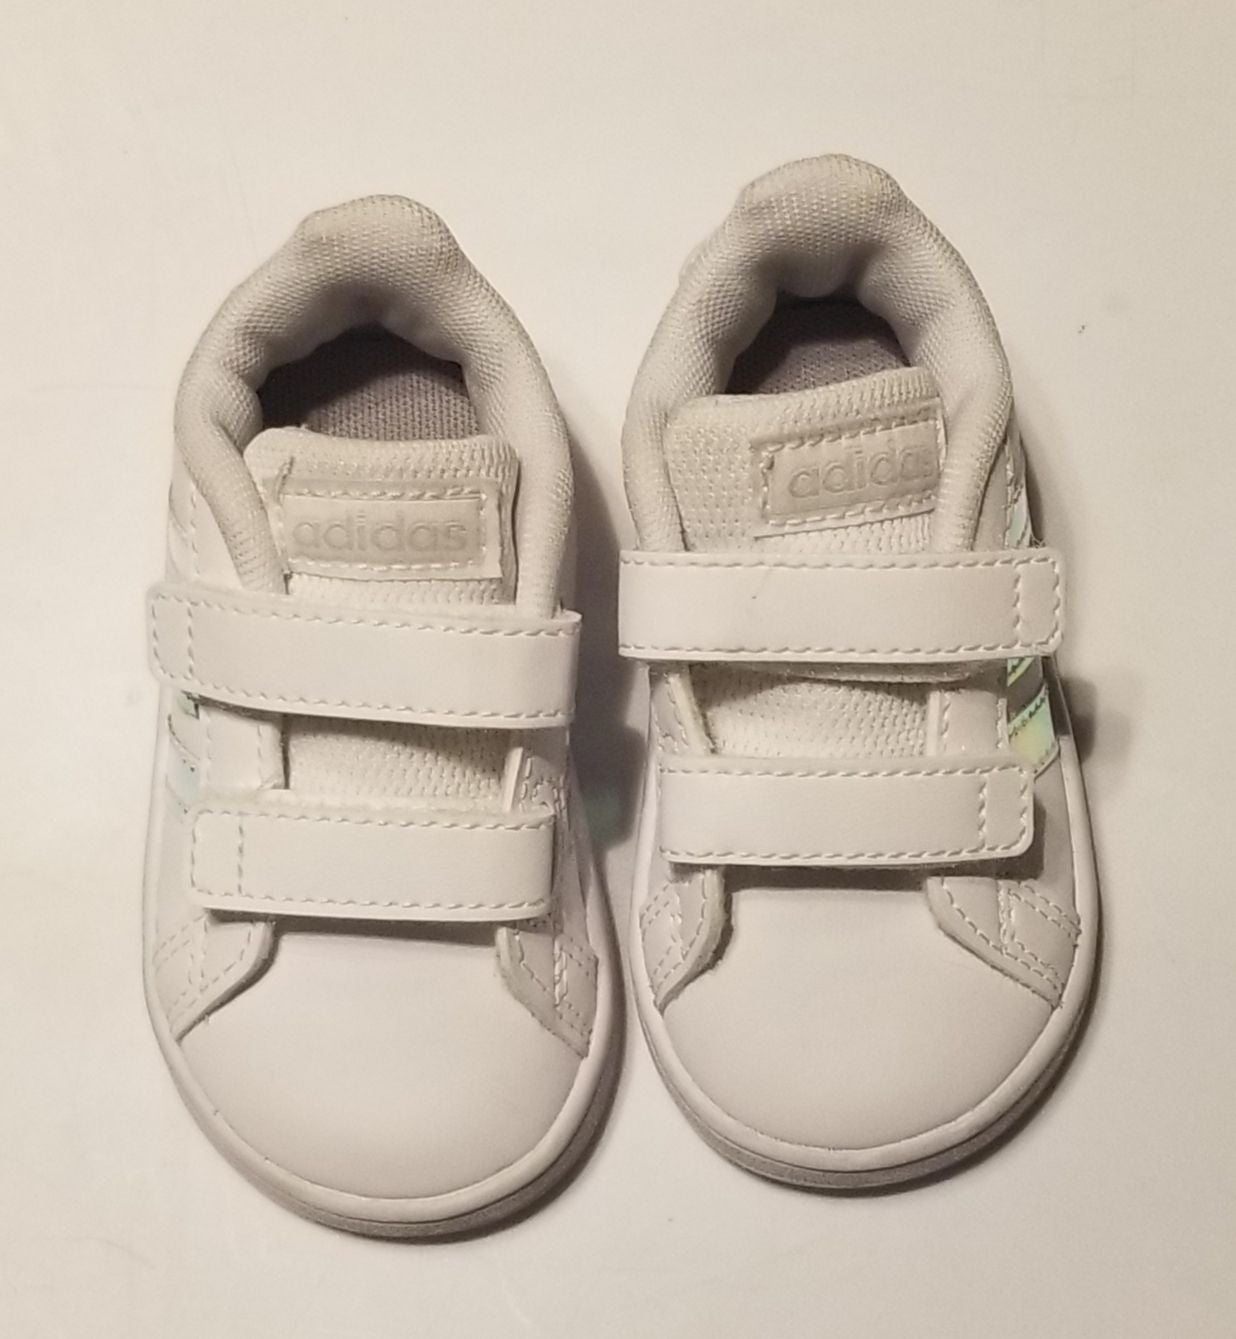 Adidas Size 4